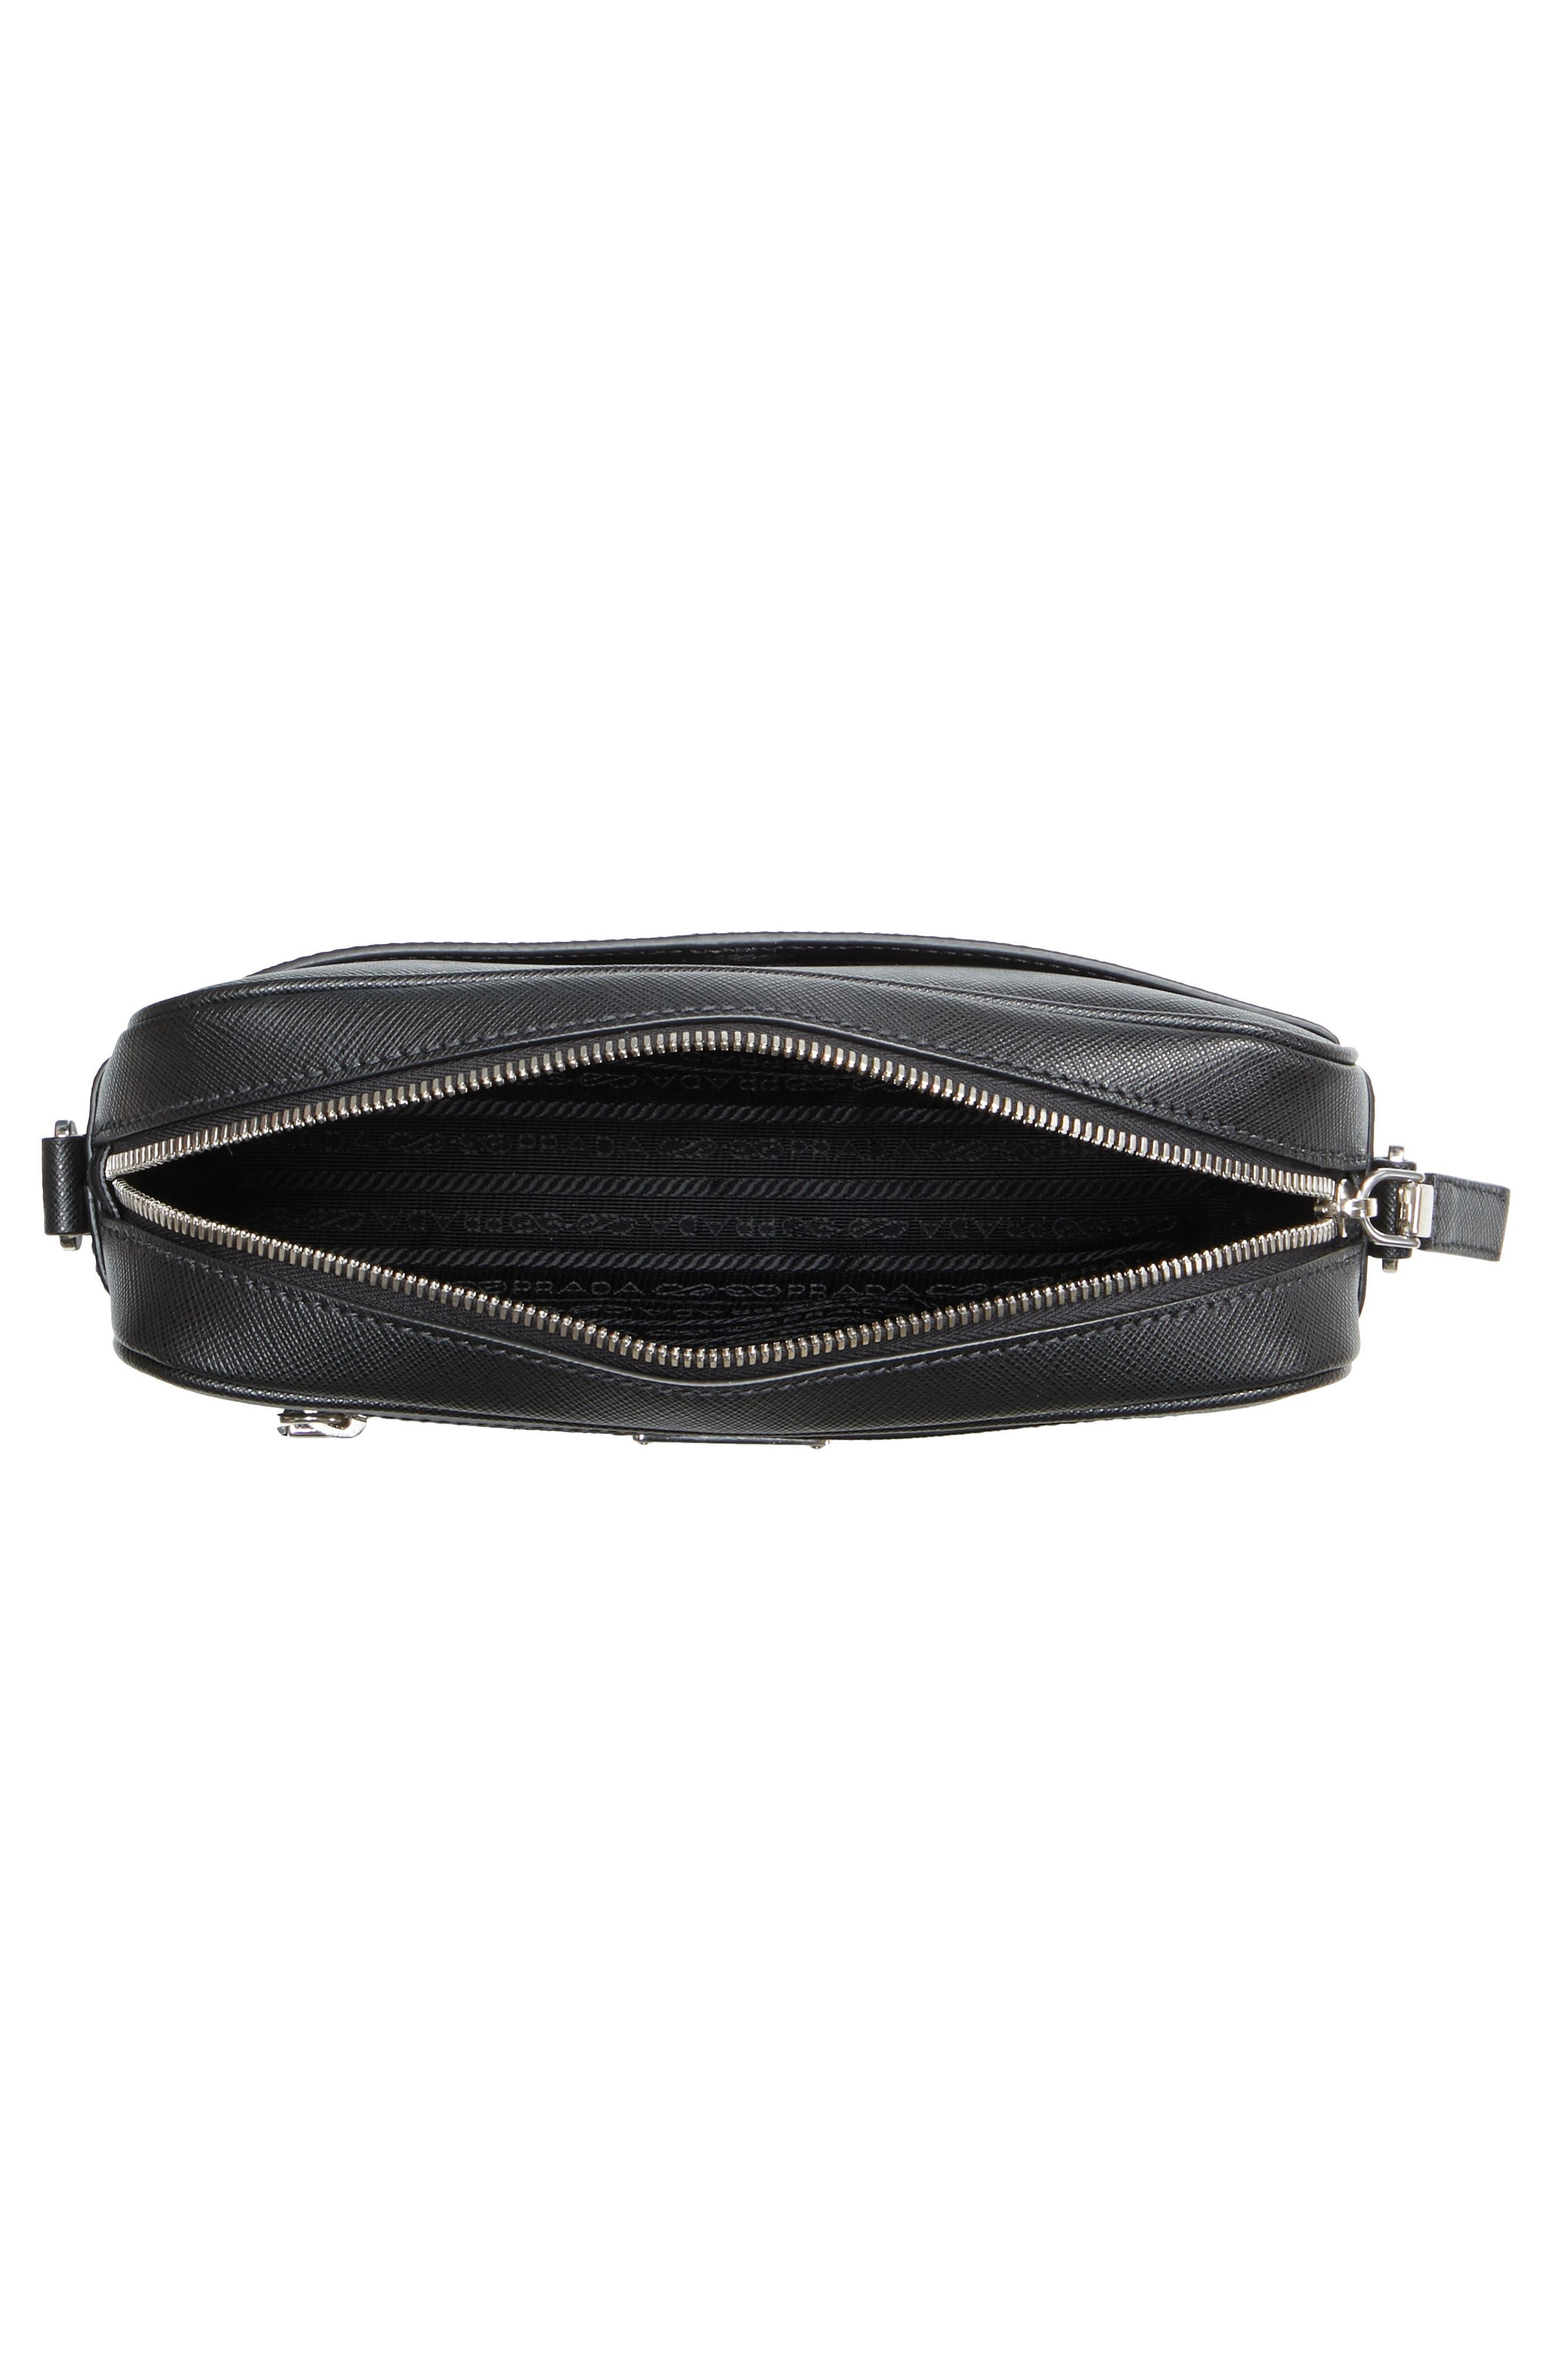 Saffiano Leather Travel Bag,                             Alternate thumbnail 4, color,                             001